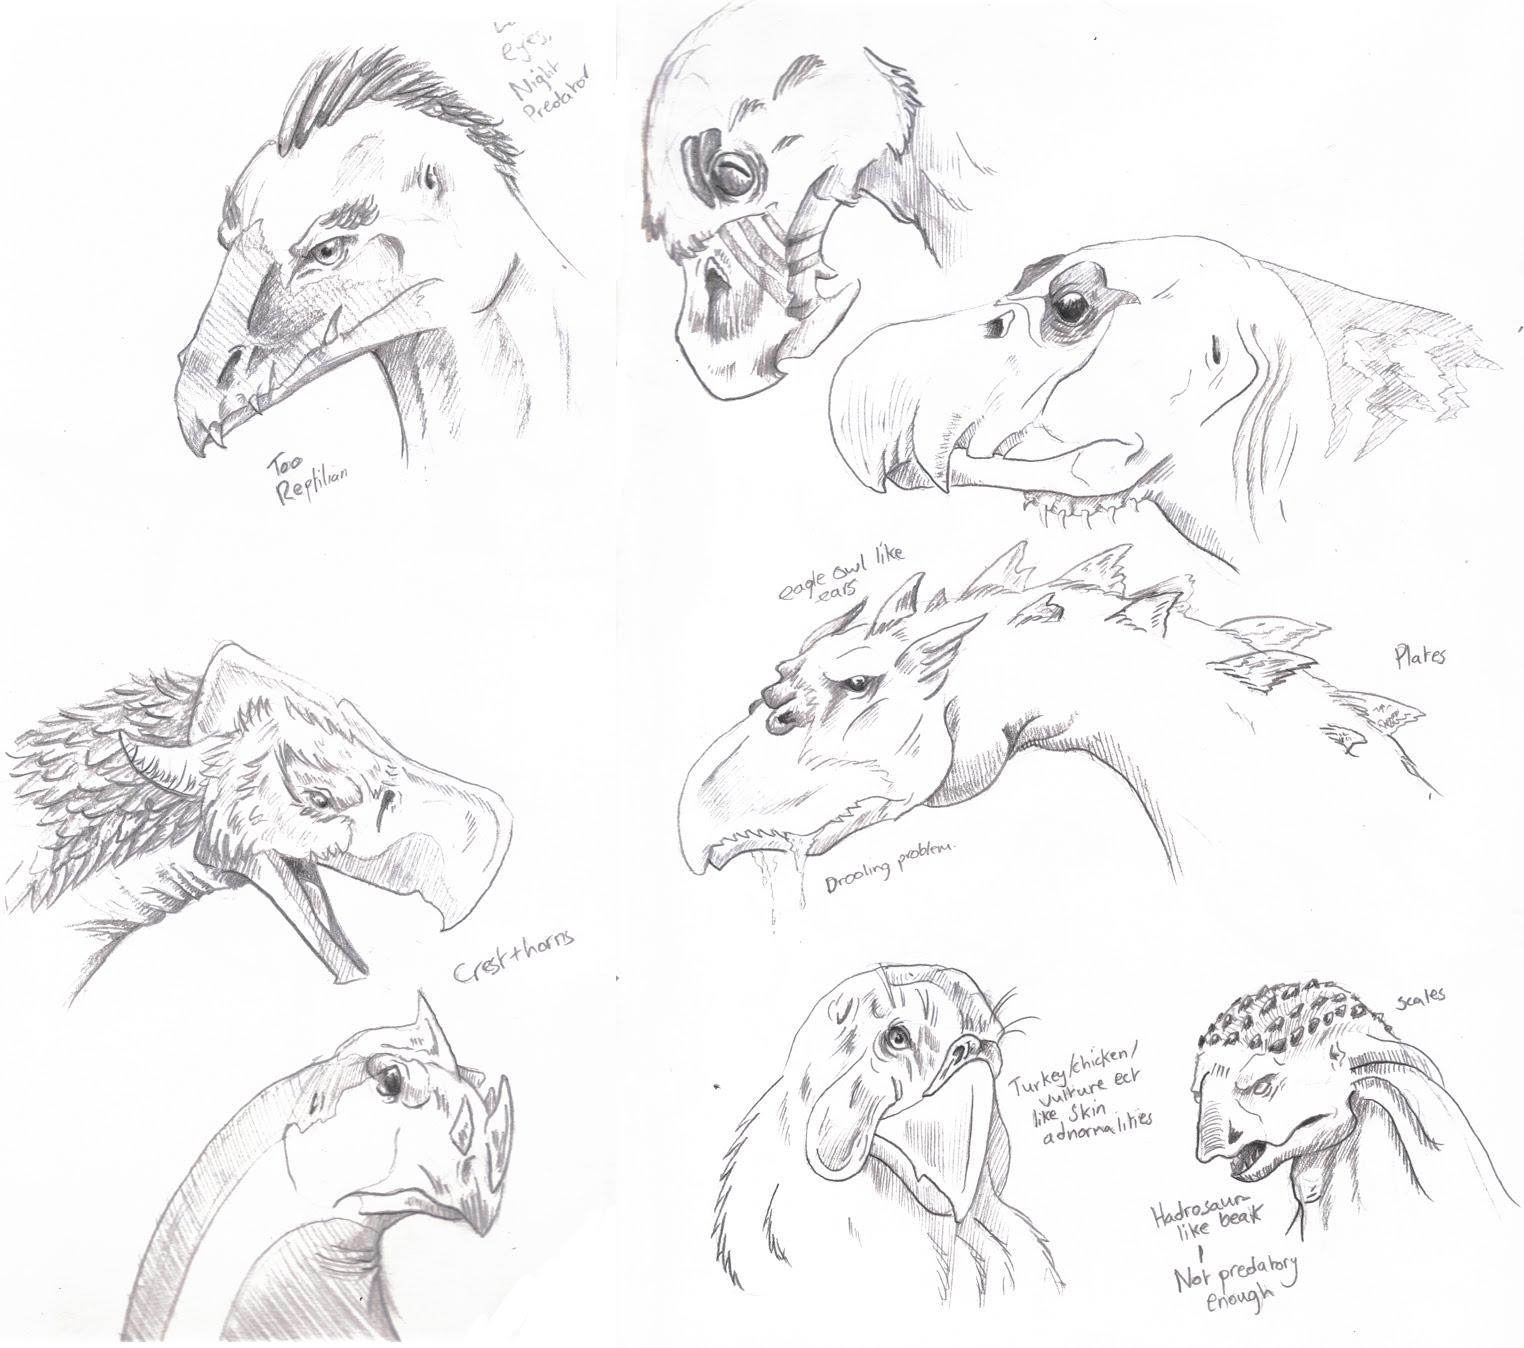 art of yasmin foster  terror bird of paradise  part 1   thumbnail sketches